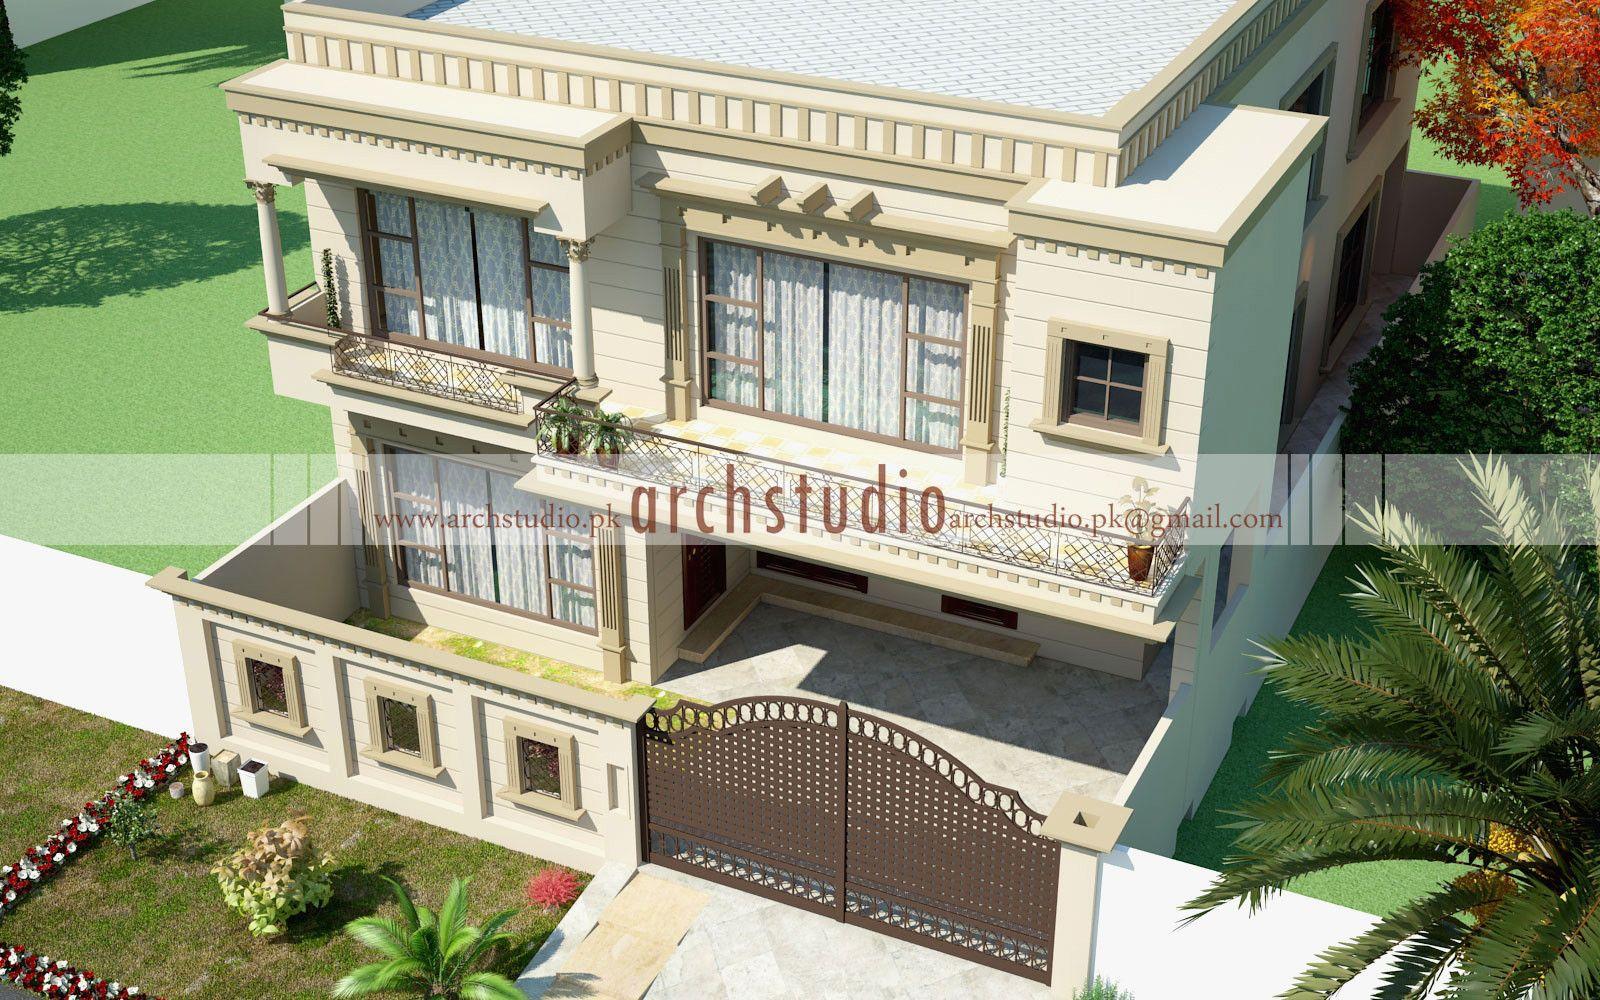 10 Marla House Architecture Design House Architecture Design House Front Design House Design